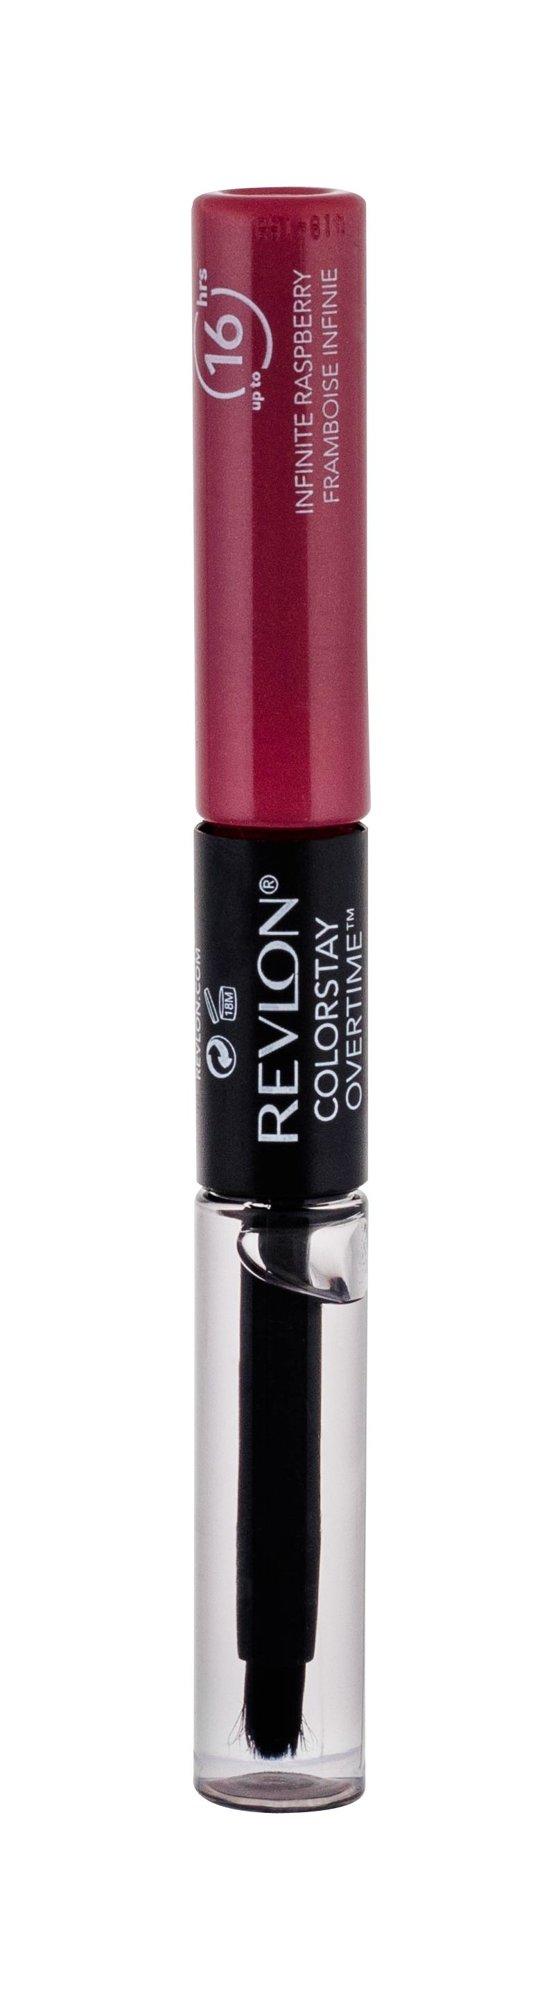 Revlon Colorstay Lipstick 4ml 005 Infinite Raspberry